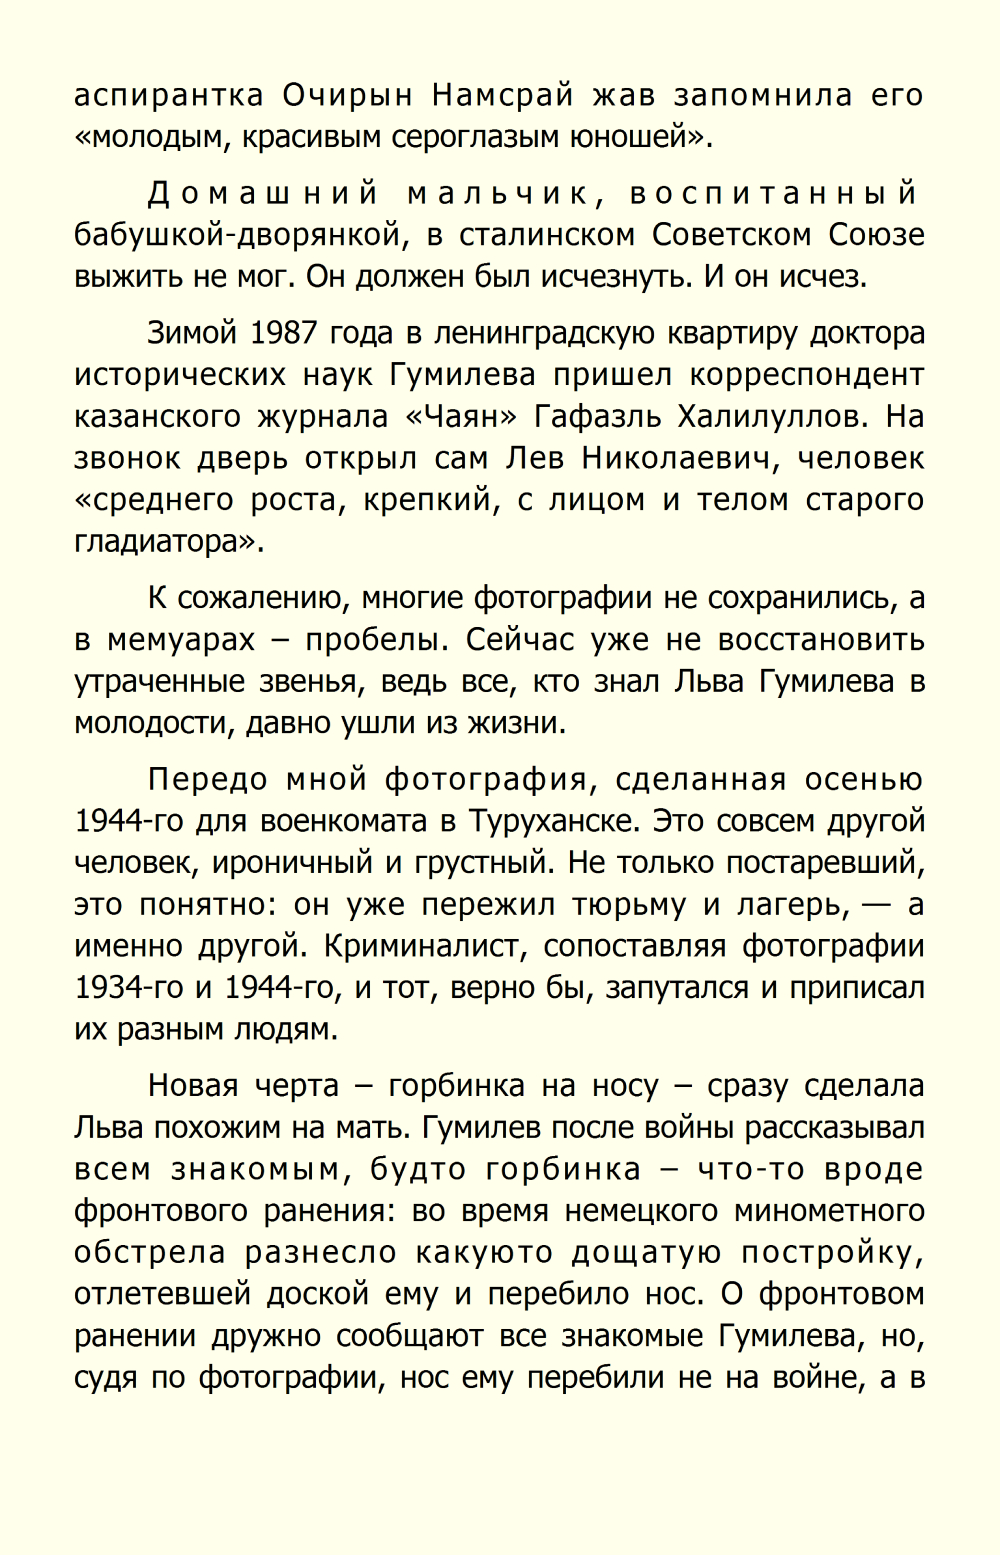 http://i6.imageban.ru/out/2013/12/12/61ffe7bf572bbf2d802986e345f09118.jpg